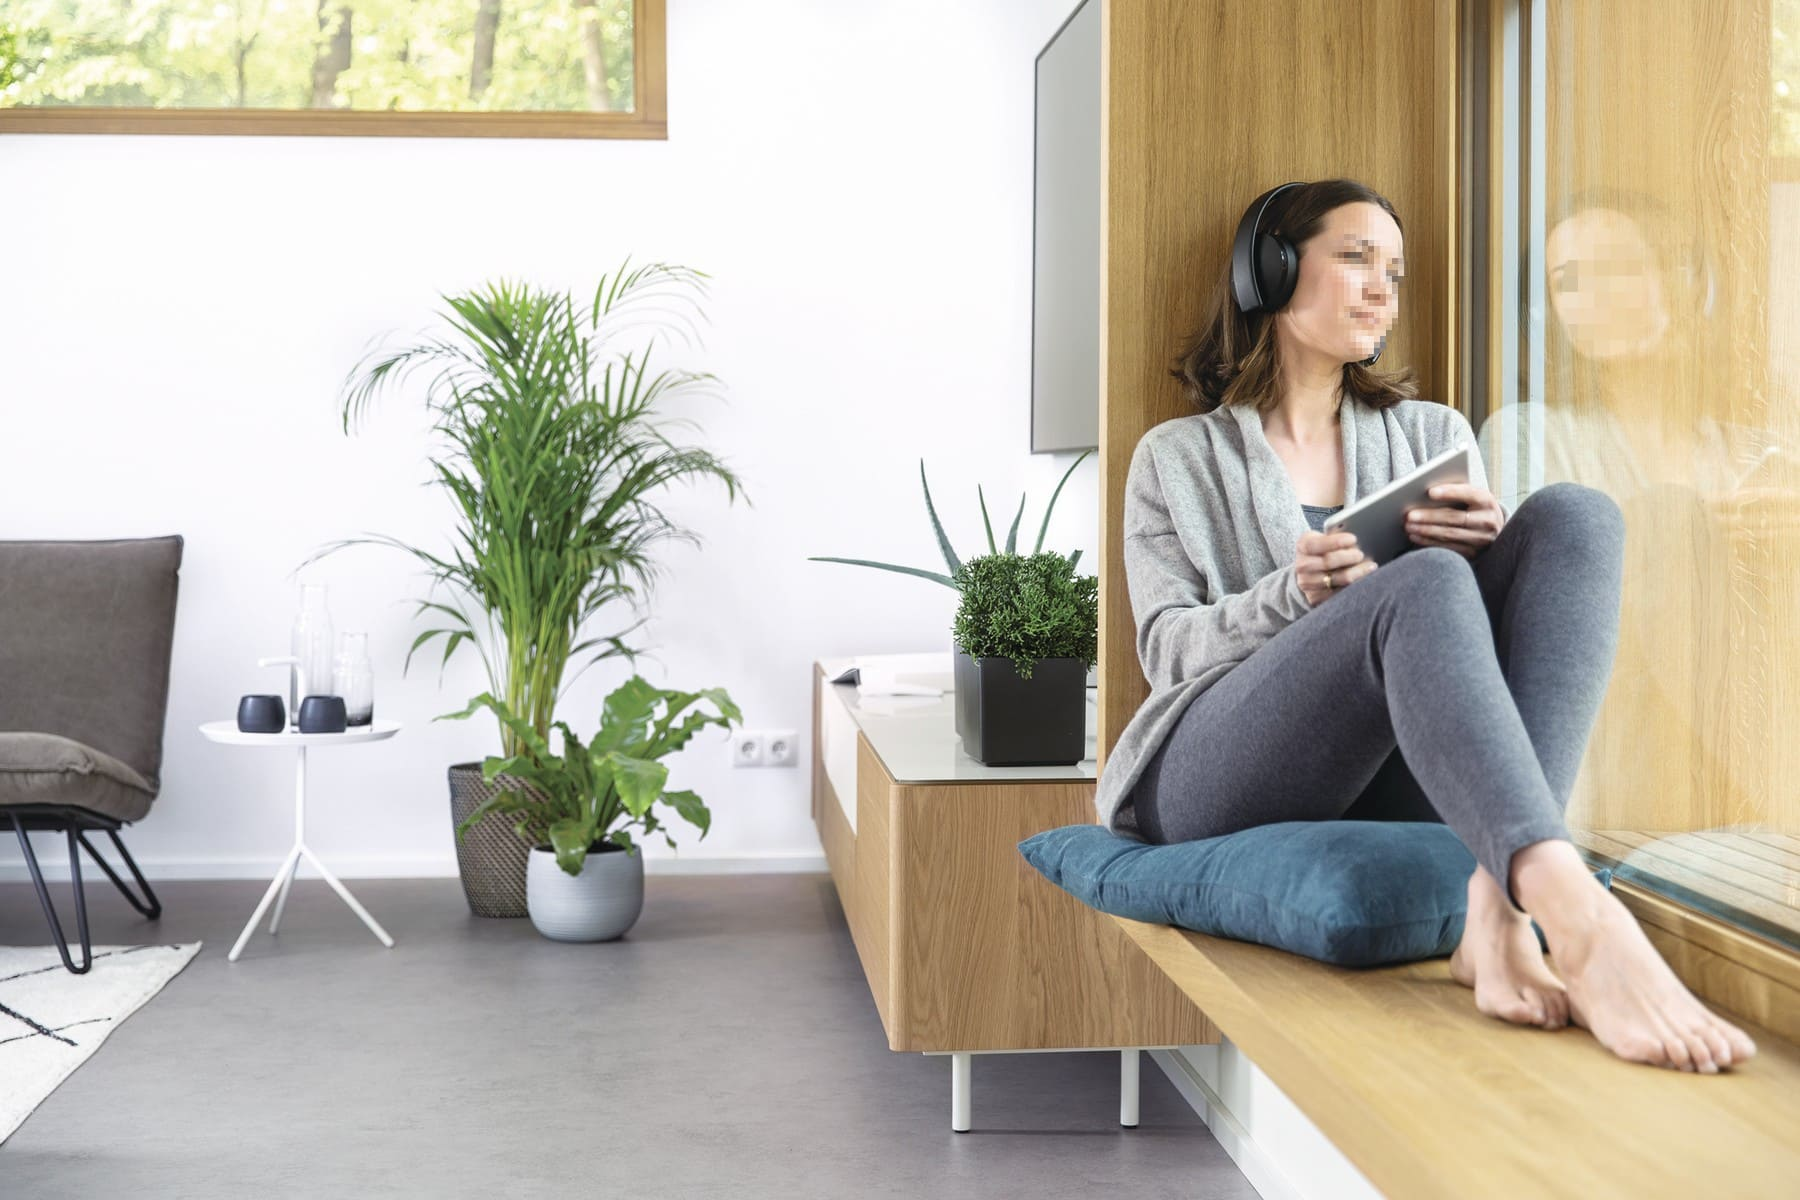 Fensterbank aus Holz mit Sitzgelegenheit - Inneneinrichtung Haus Design Ideen - Fertighaus Sunshine 220 WeberHaus - HausbauDirekt.de